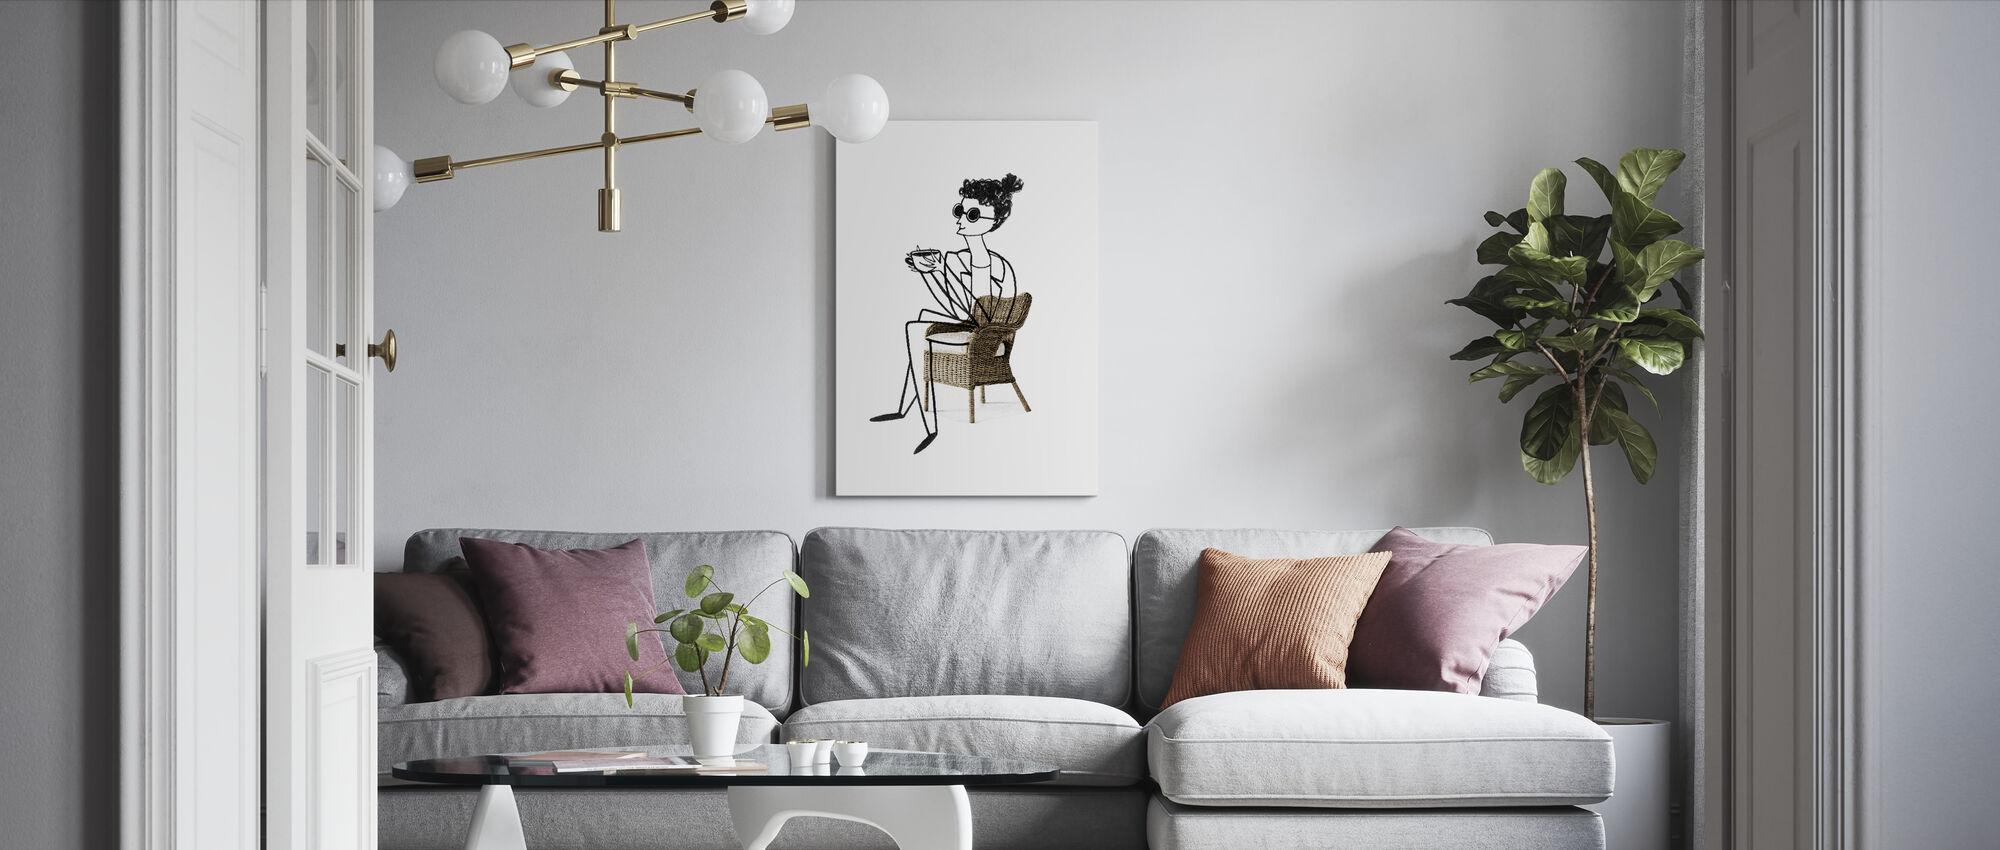 Woman Drinking Coffee - Canvas print - Living Room